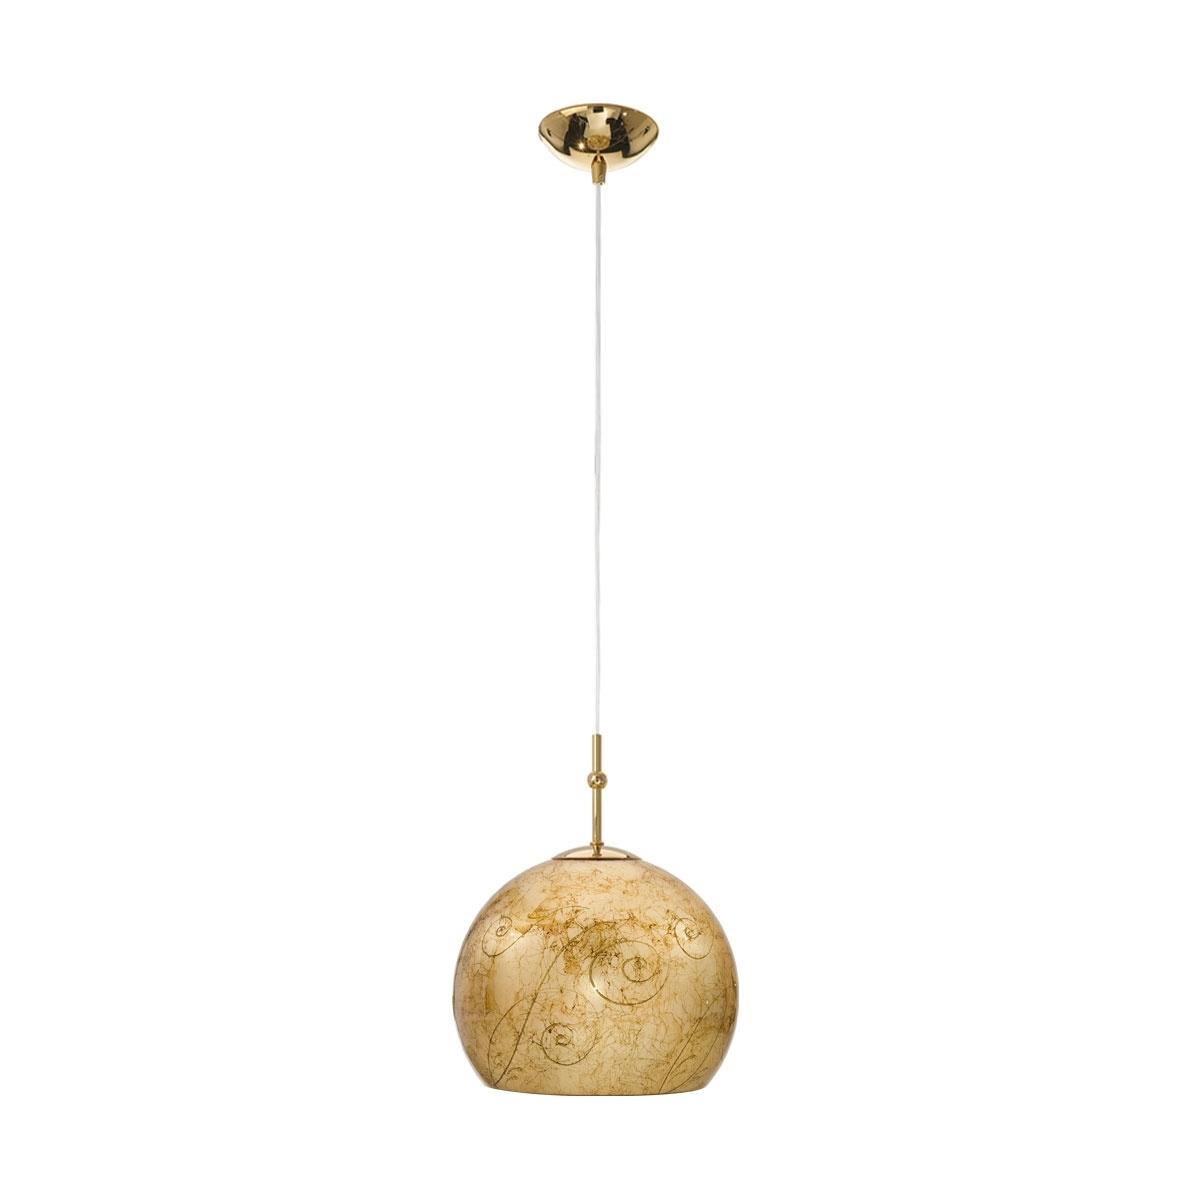 kolarz-pendelleuchte-luna-pl-gold-glas-metall-0392-31s-3-me-au